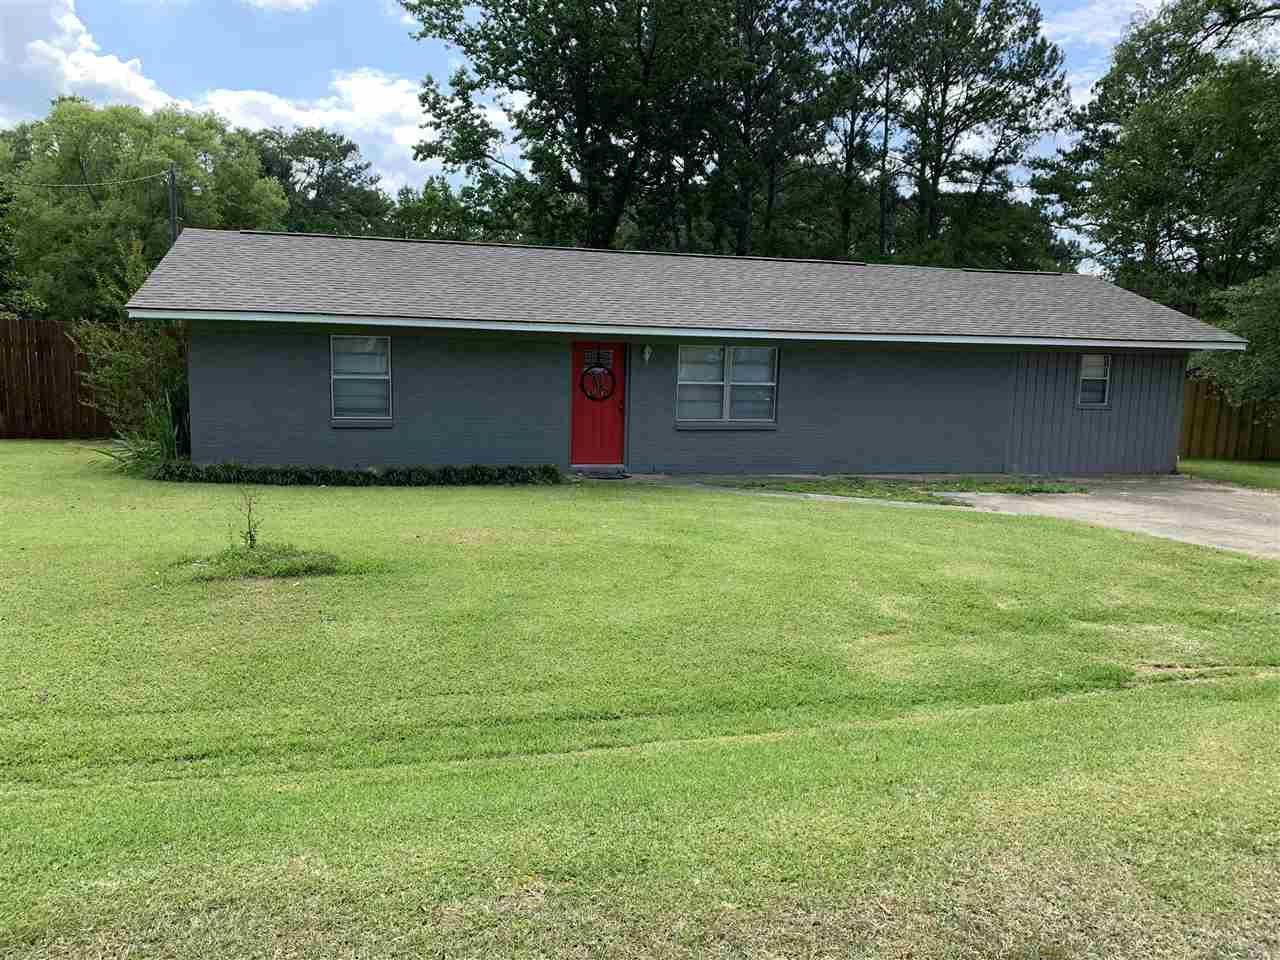 604 VIRGIL ST, Taylorsville, MS 39168 - MLS#: 331842